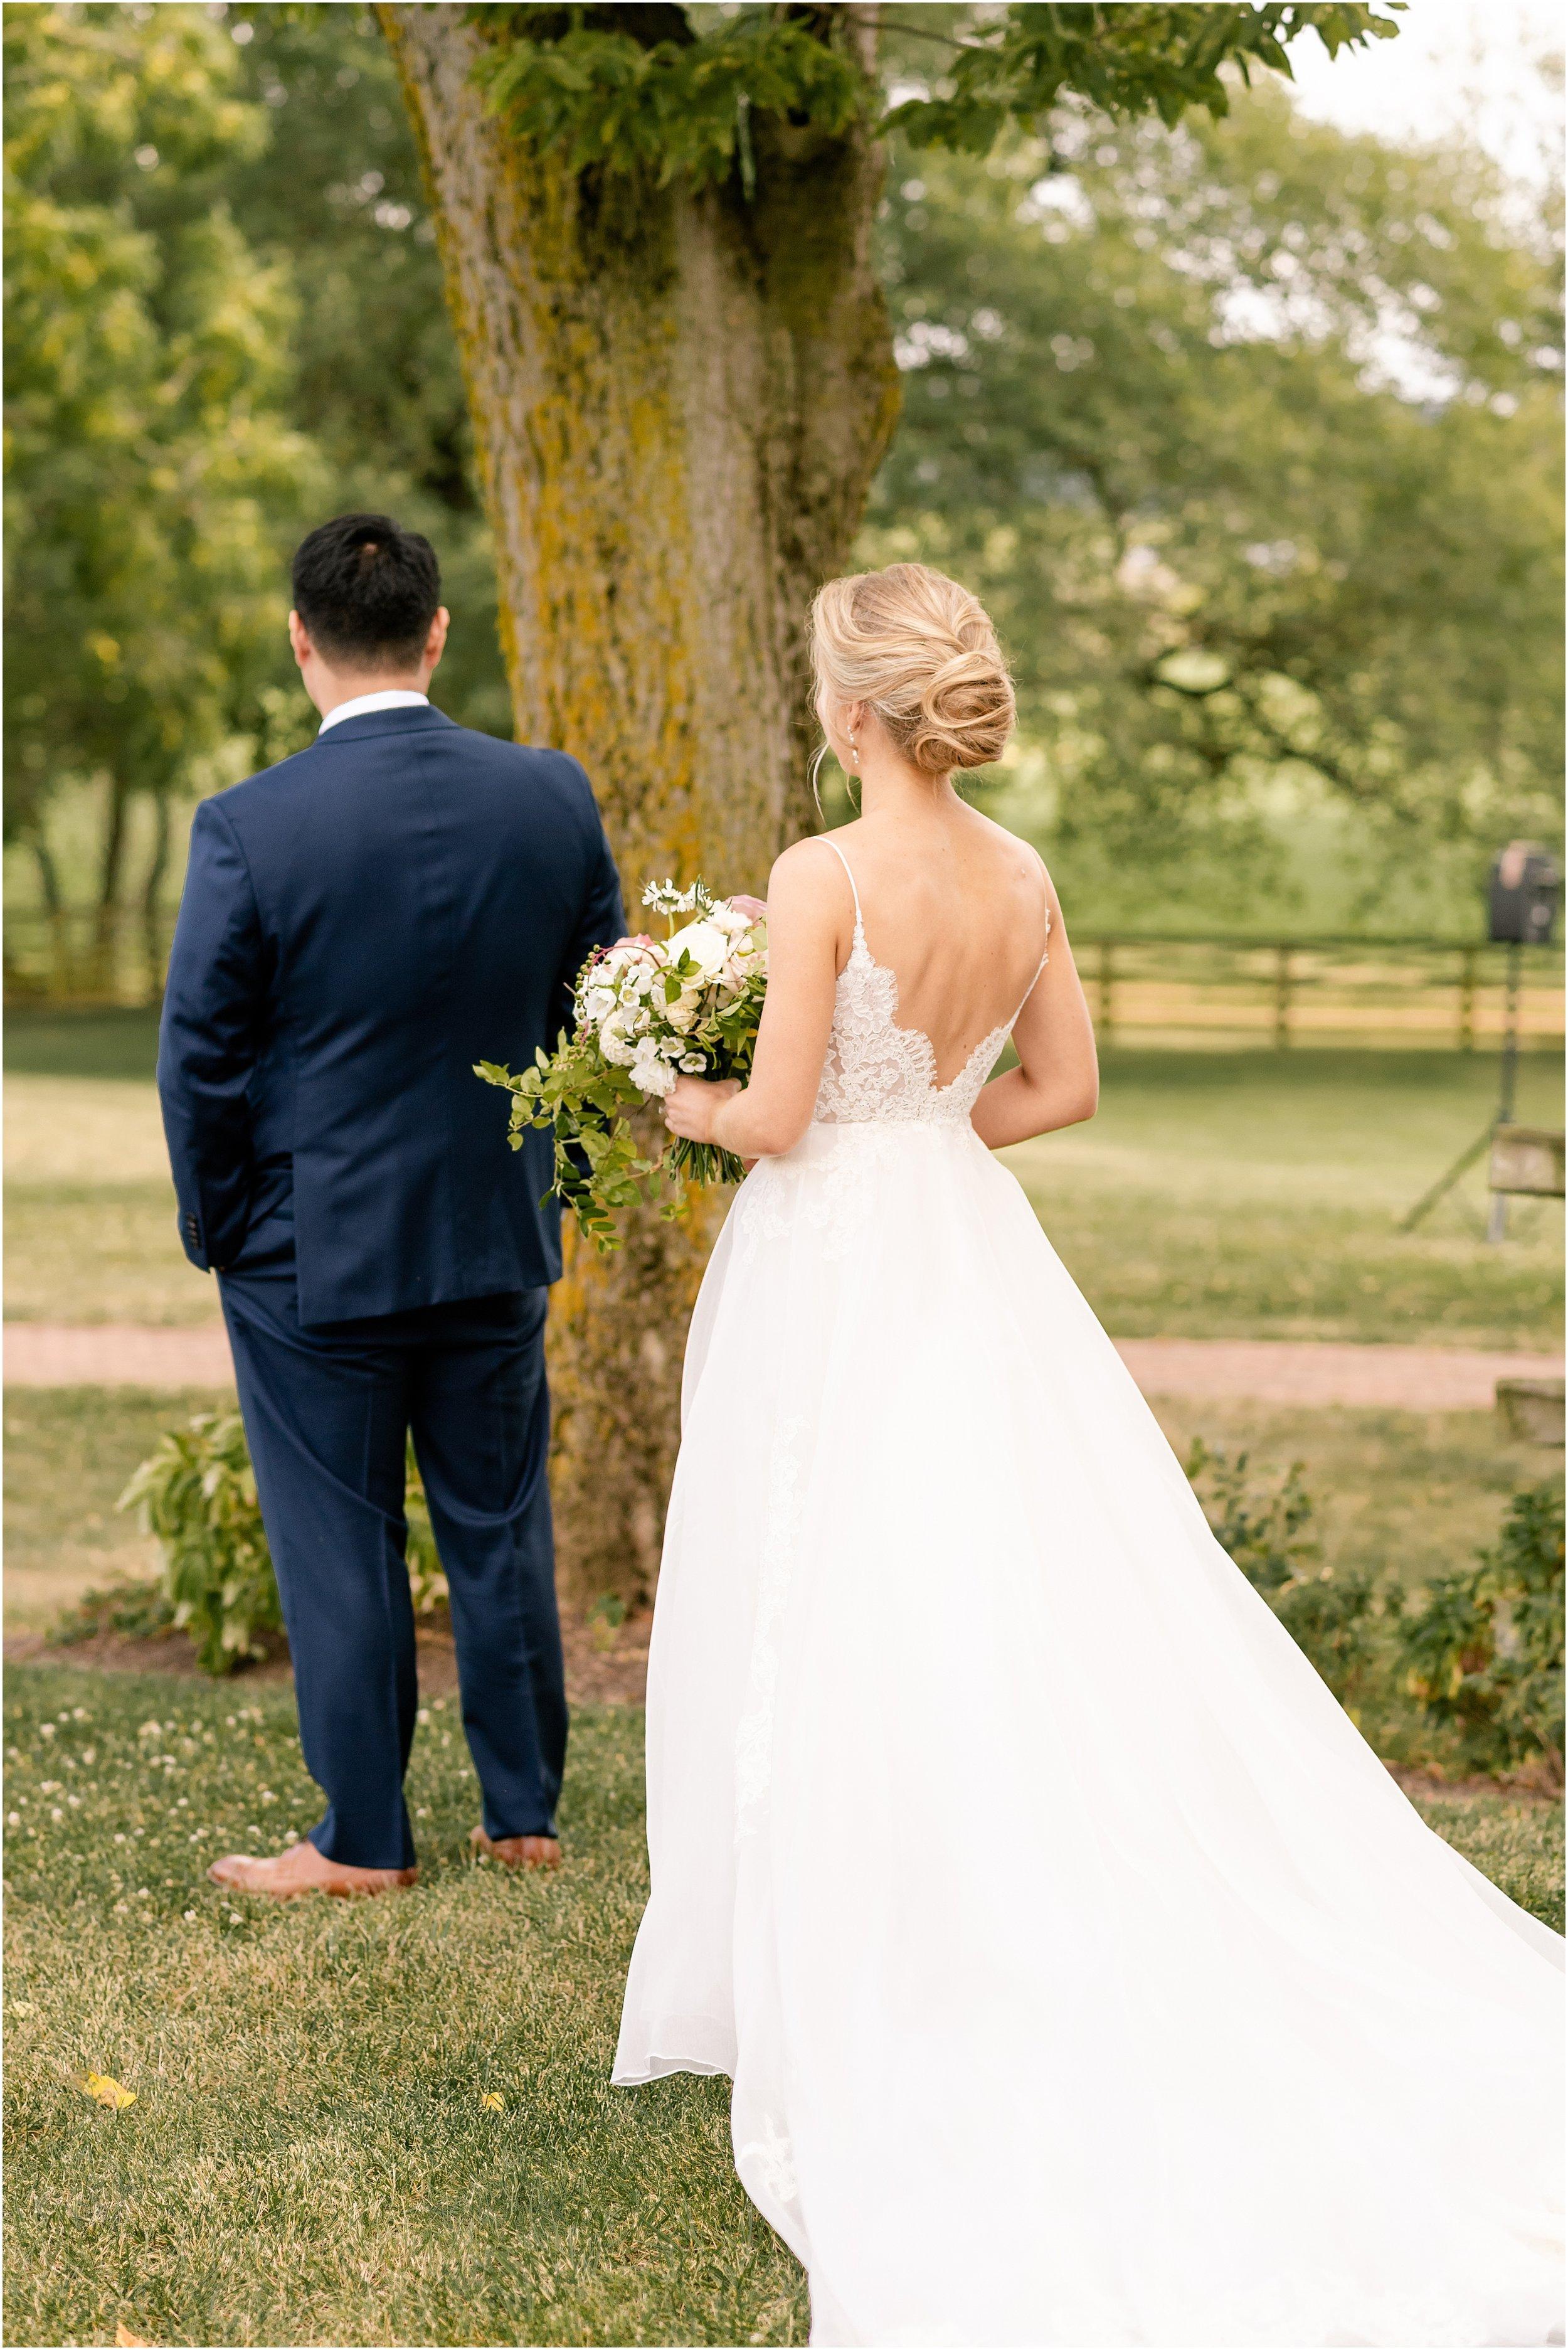 hannah leigh photography Walkers Overlook Wedding Walkersville MD_3499.jpg